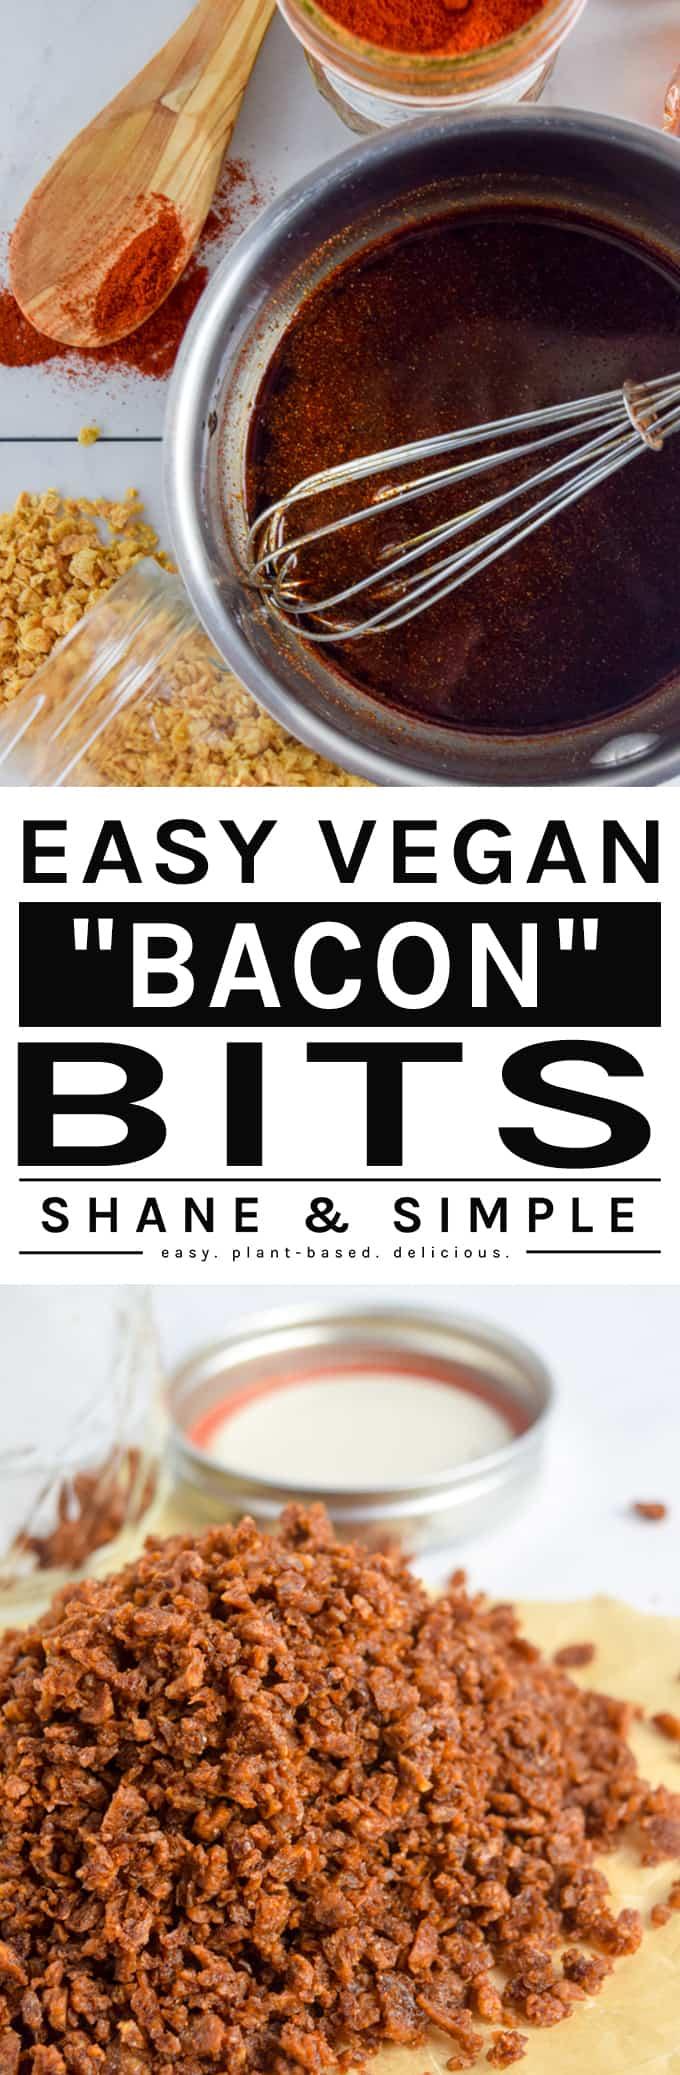 Easy Vegan Bacon Bits